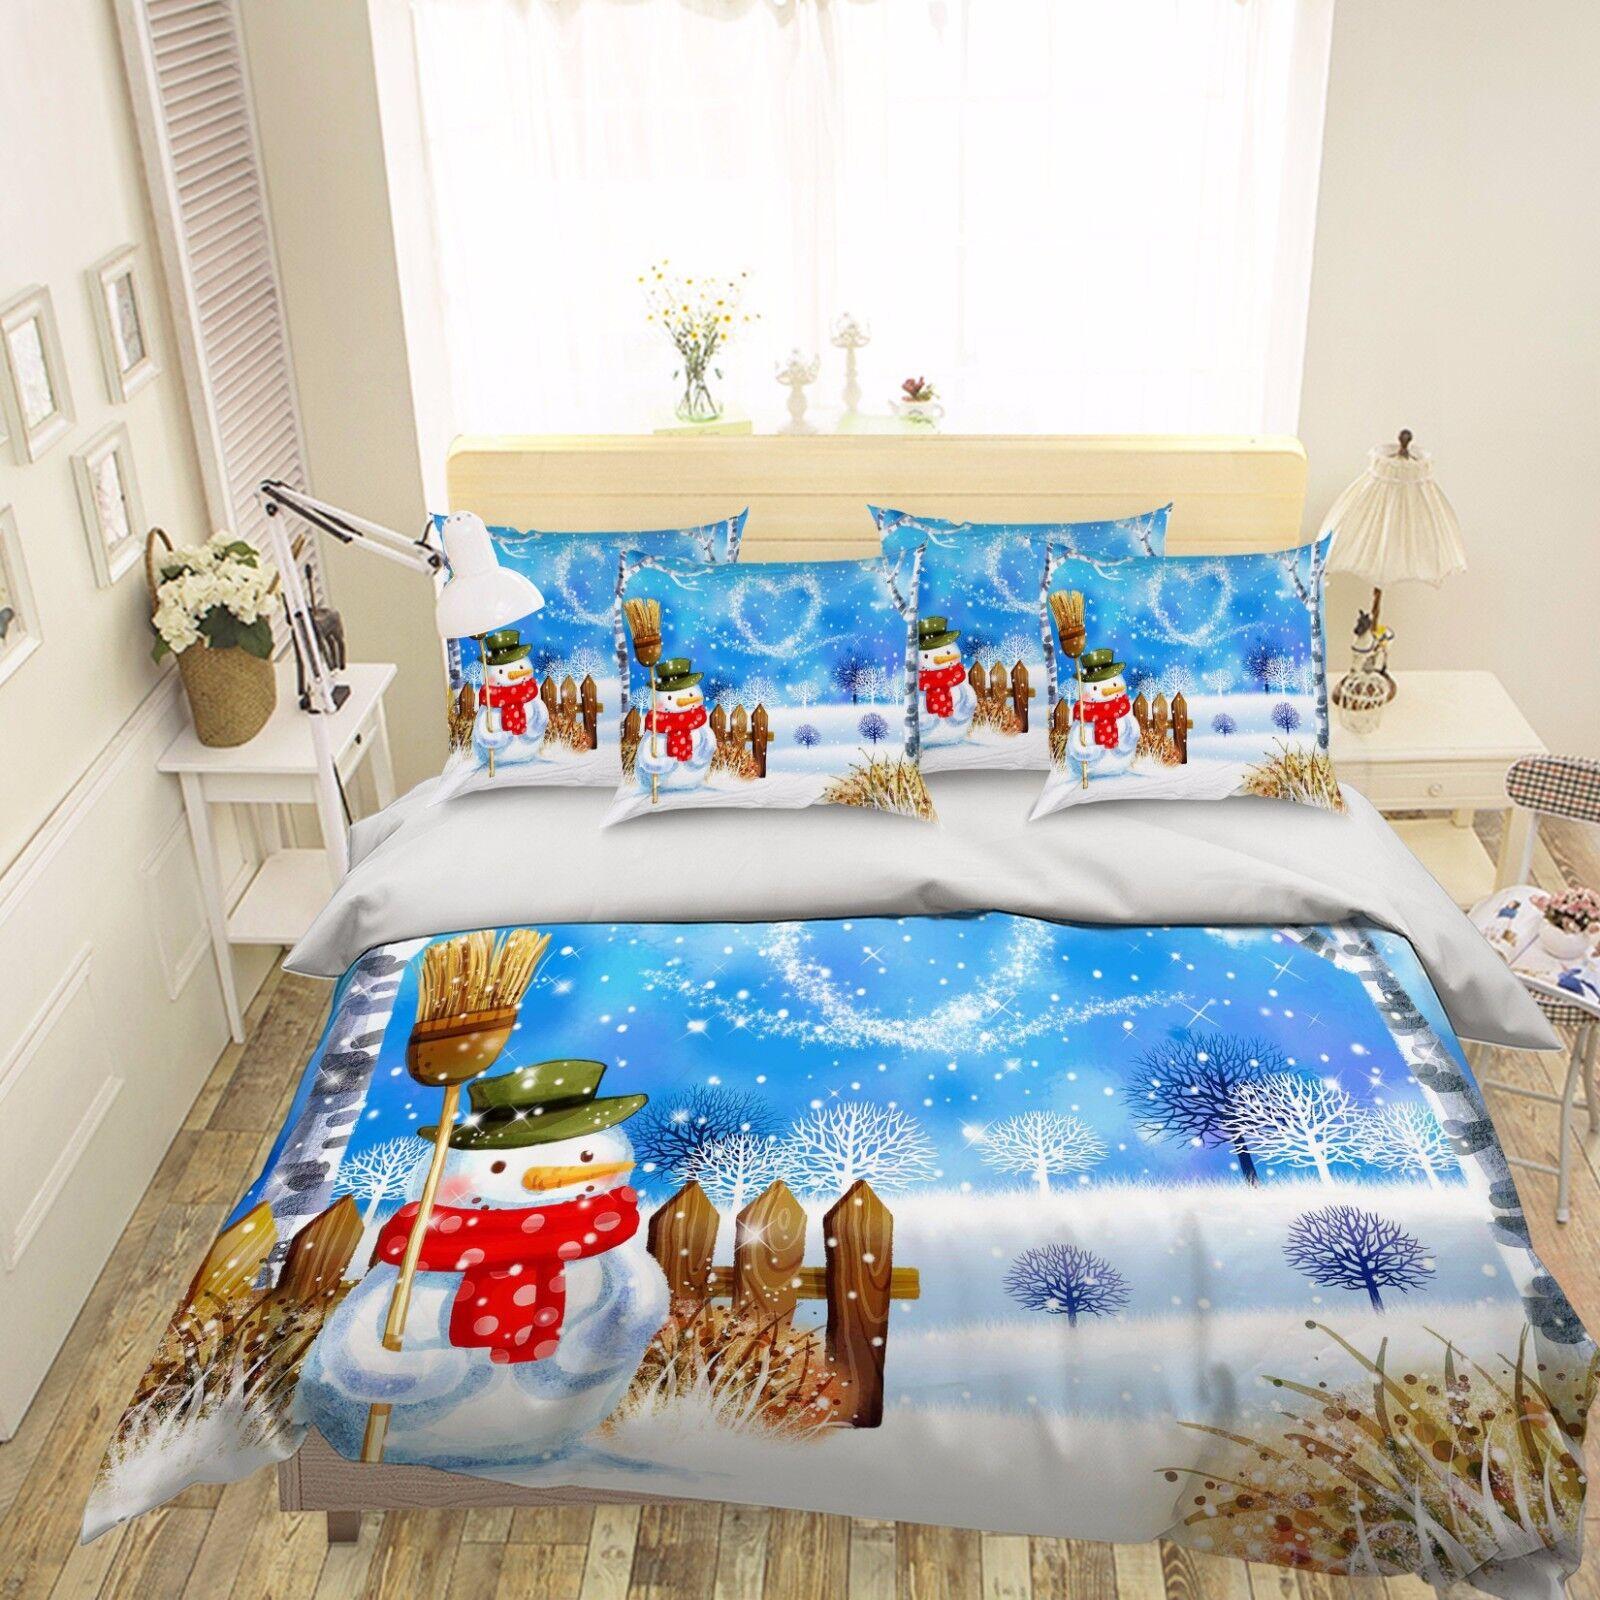 3D Snowman Scenery 578 Bed Pillowcases Quilt Duvet Cover Set Single Queen CA